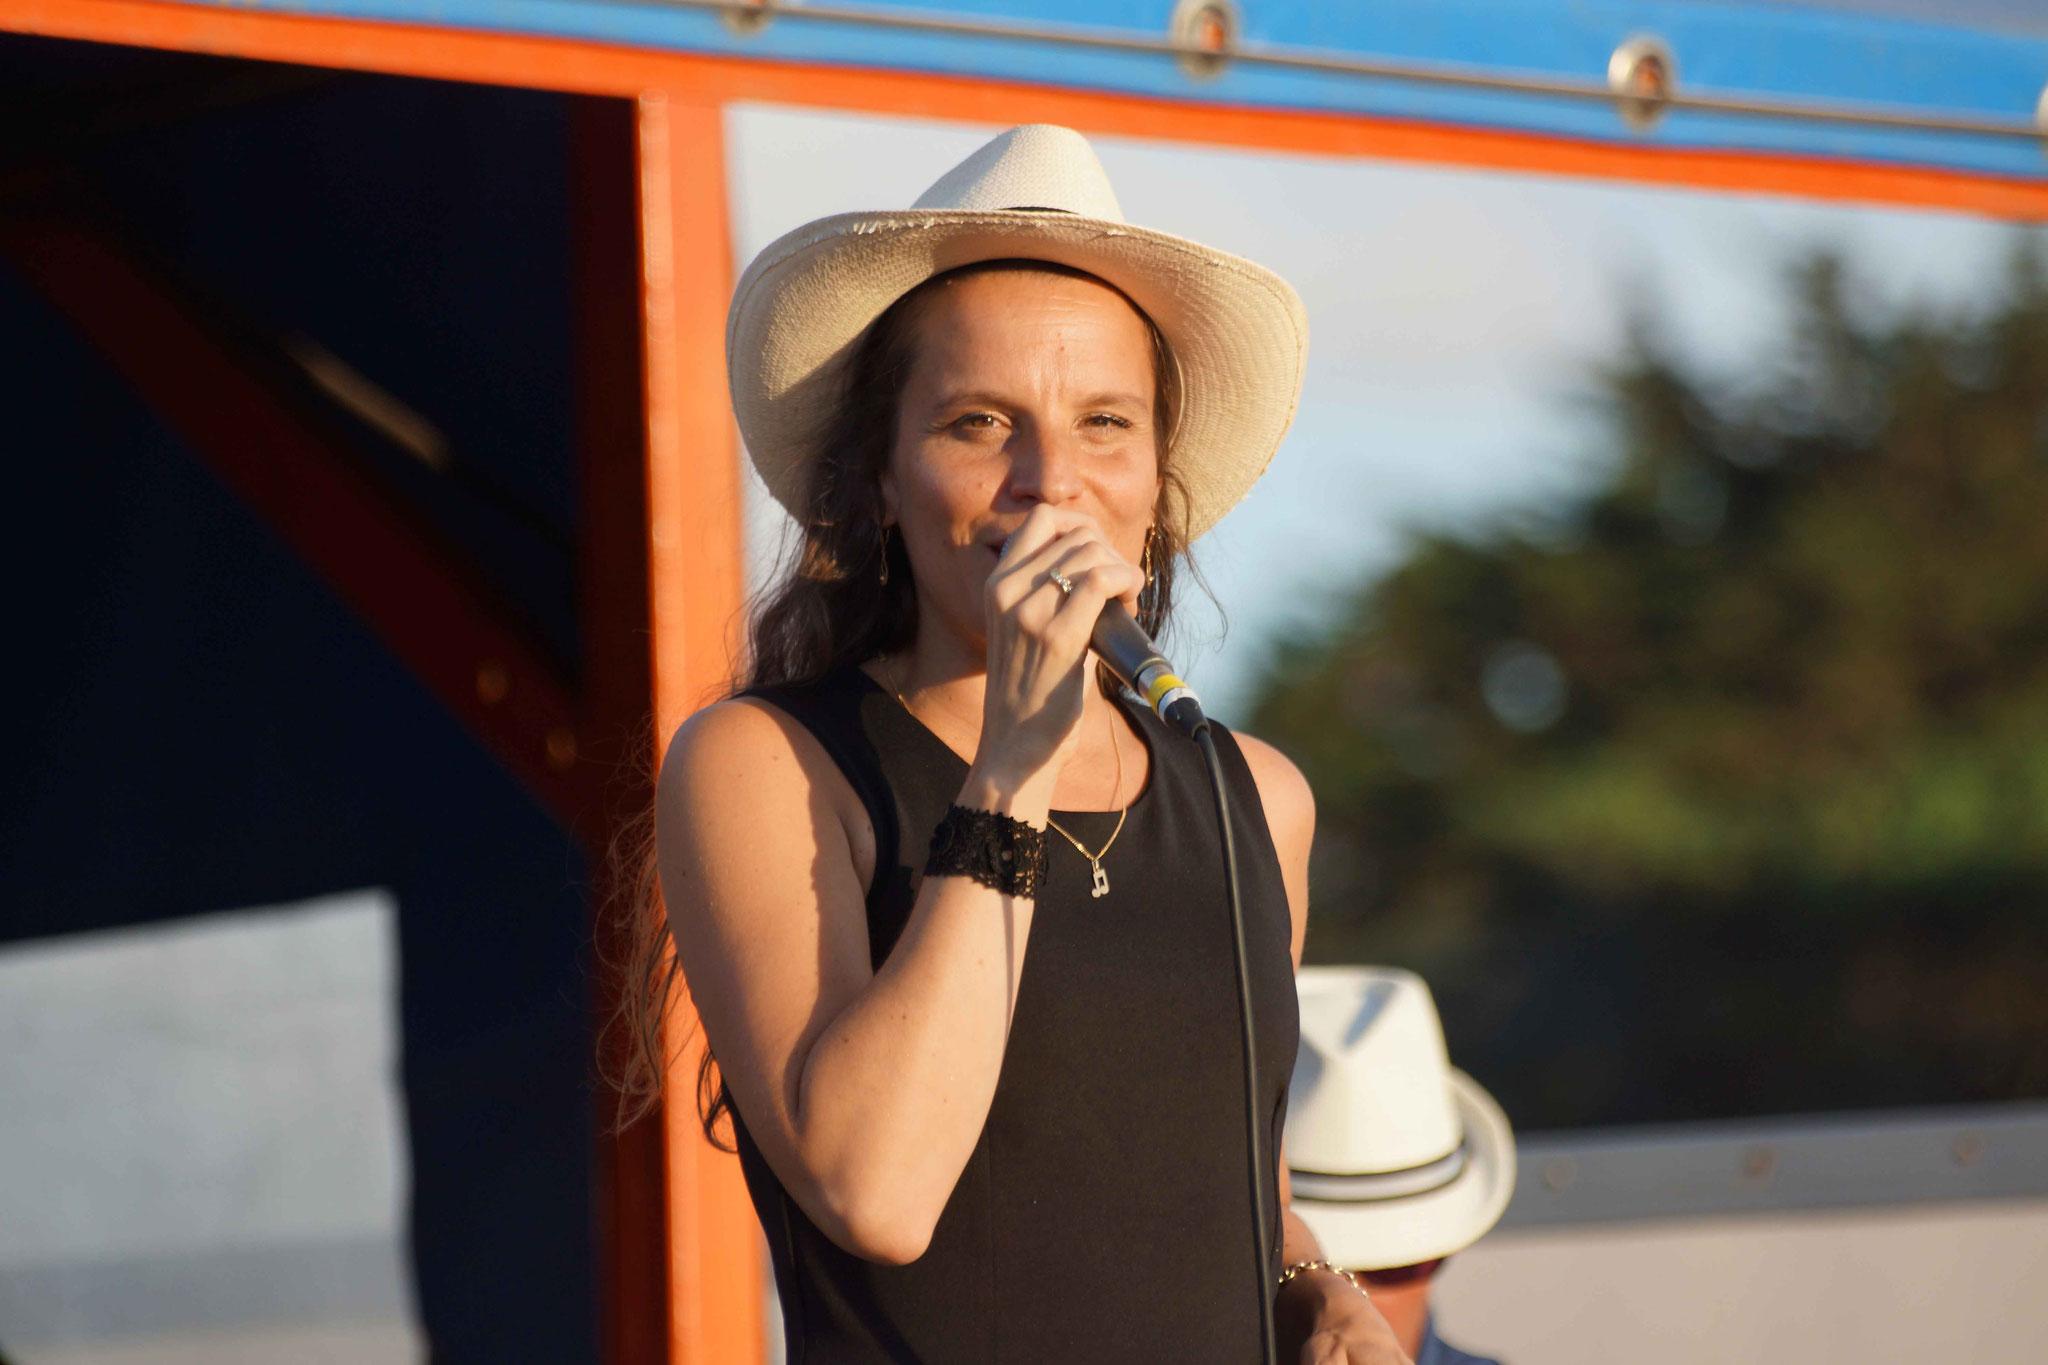 Clarisse Lavanant, Moguériec, samedi 30 juillet 2016